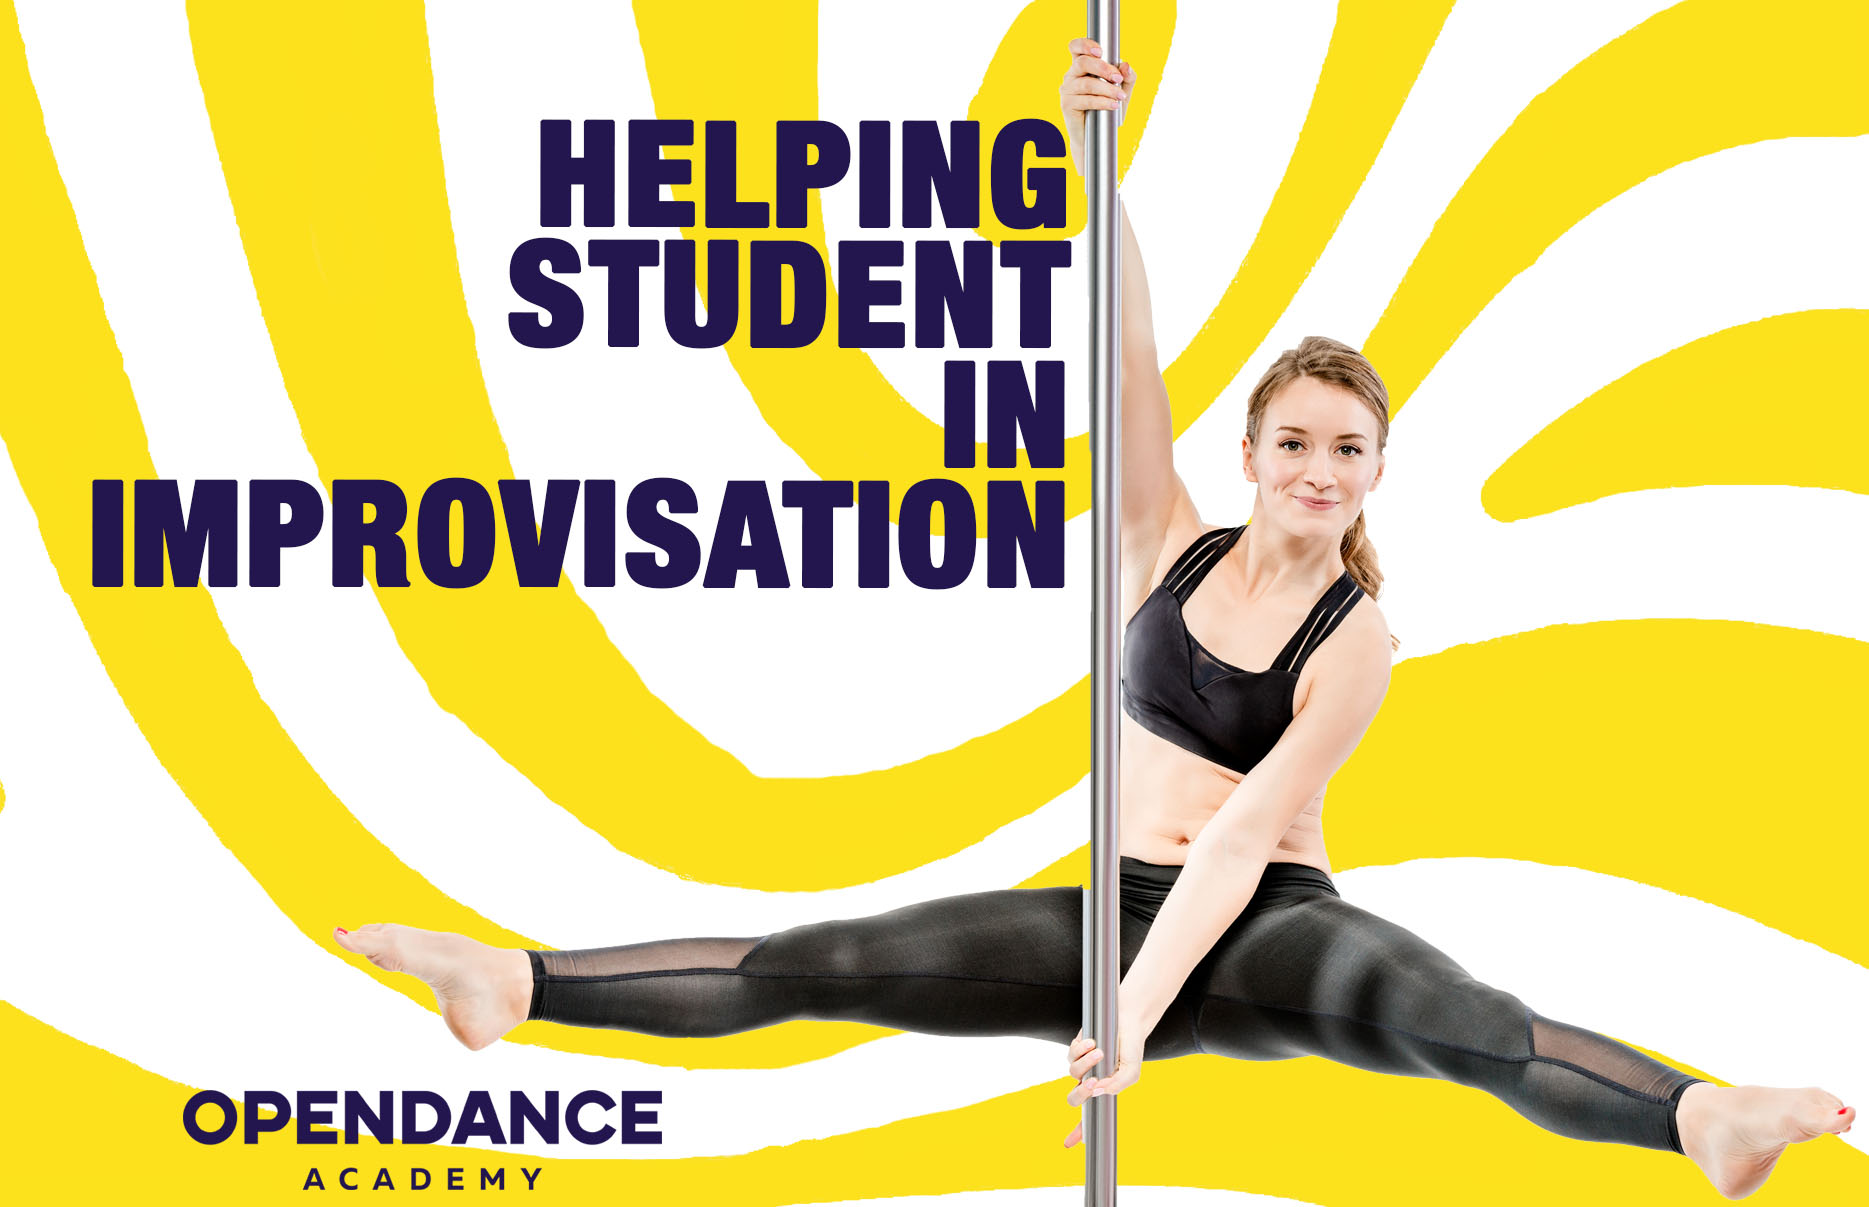 Helping Student In Improvisation